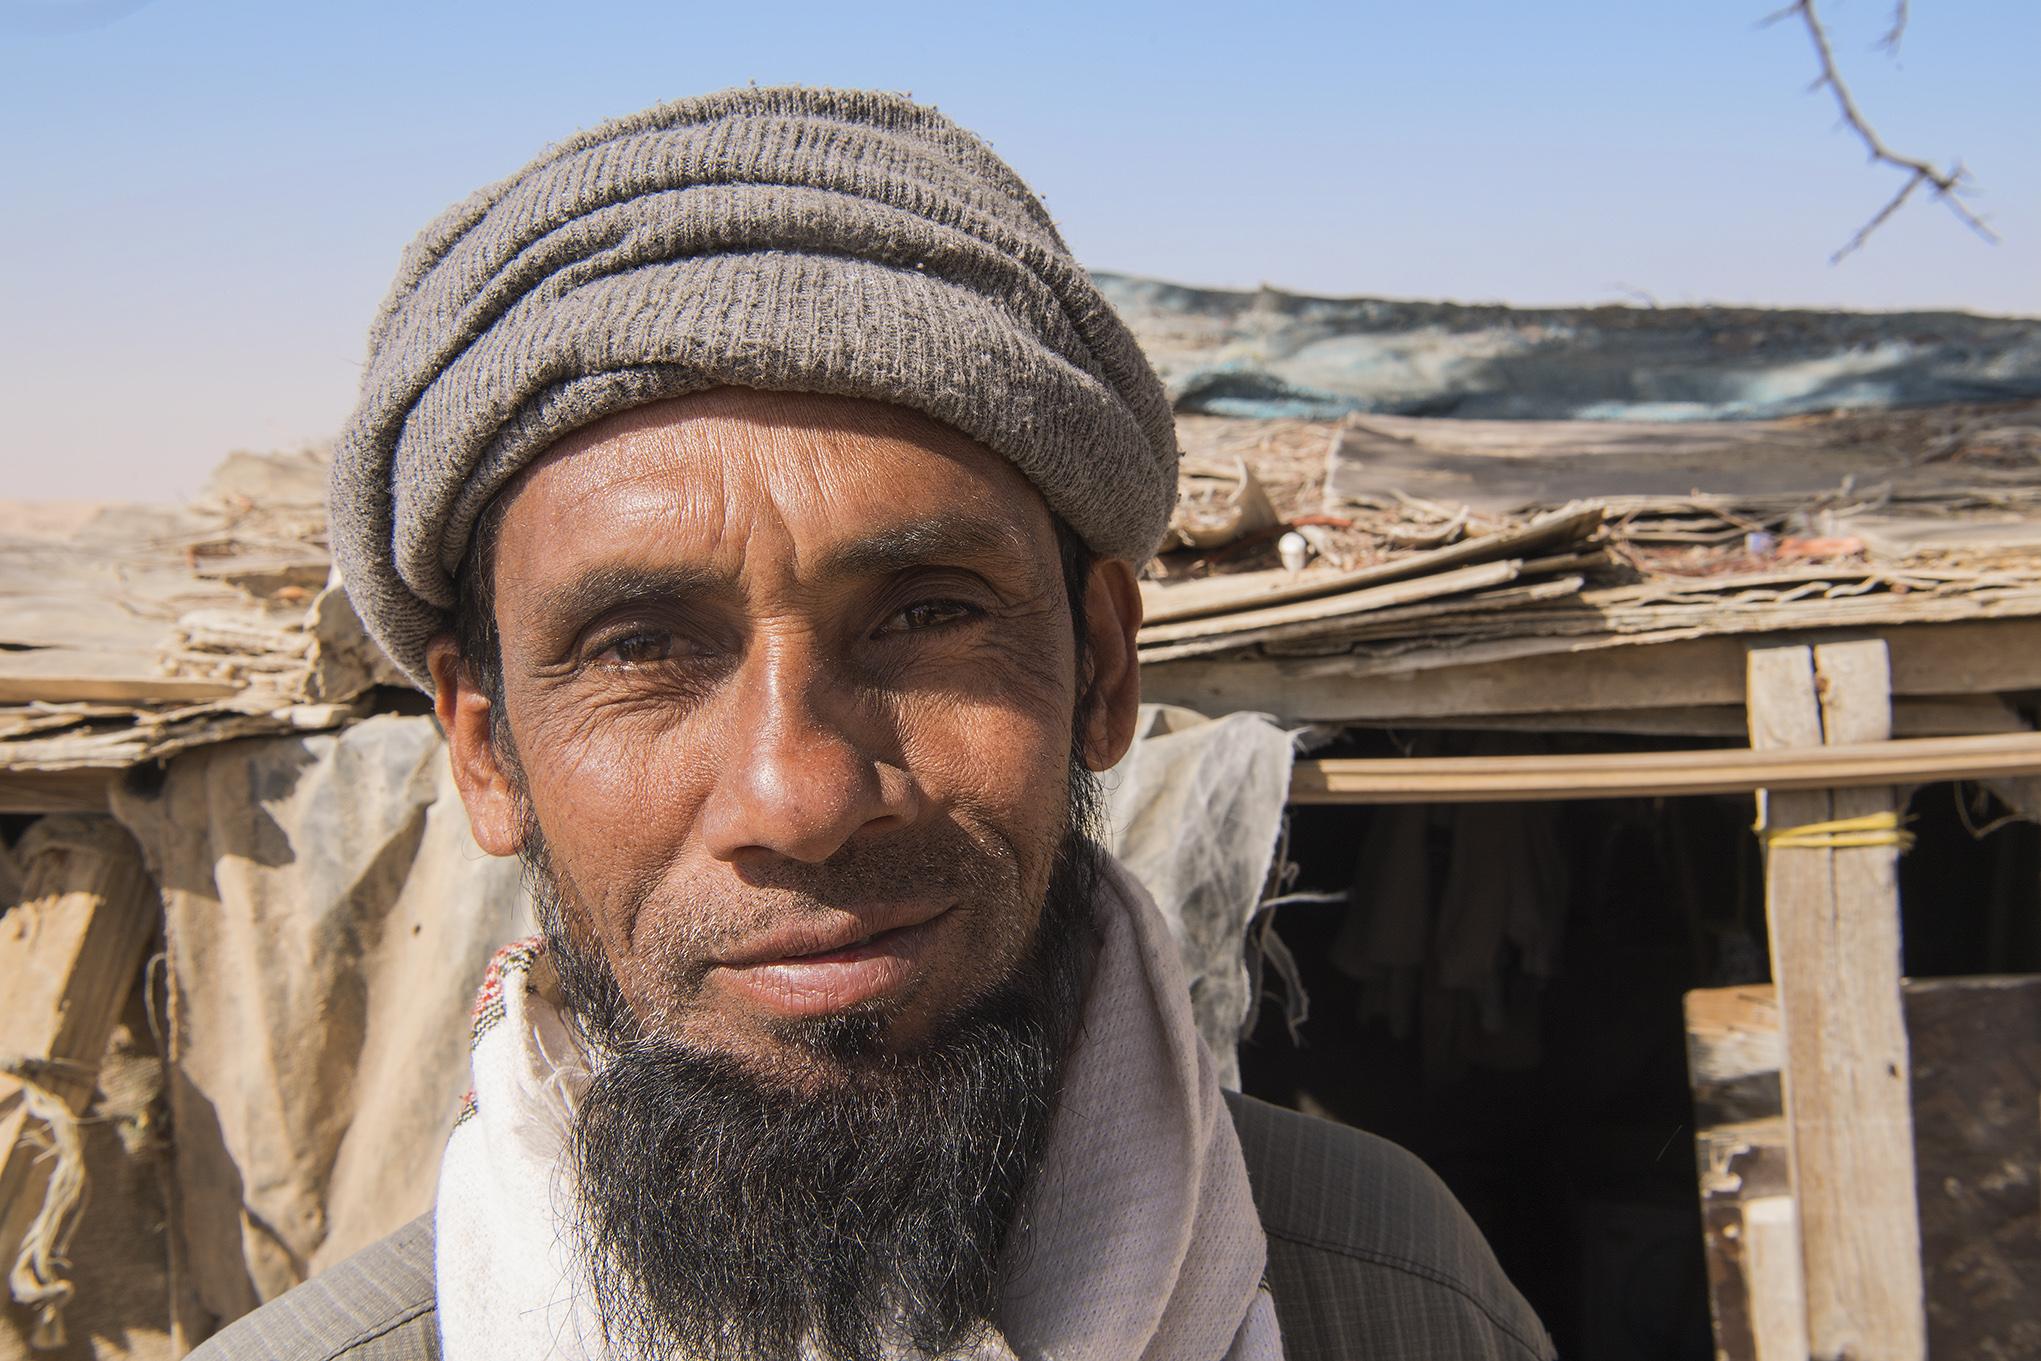 Kamelhirte, Oman